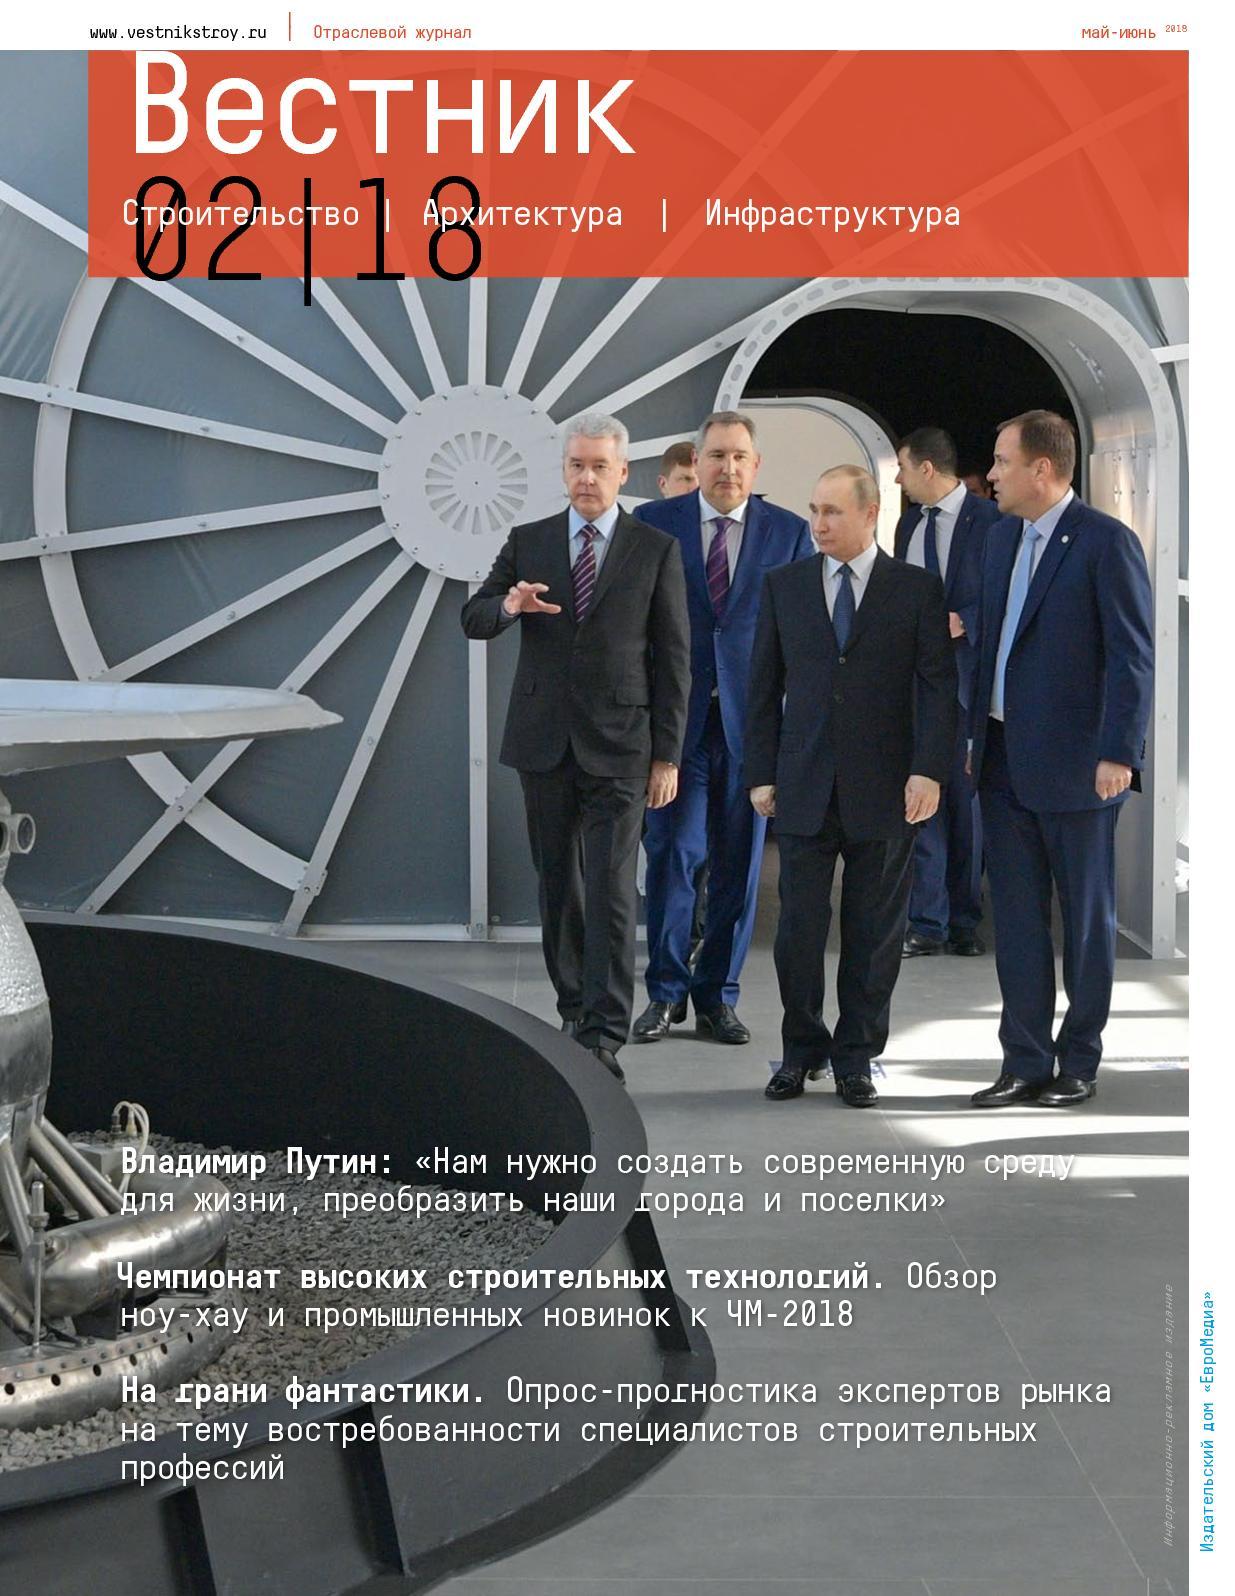 1b19e8f84c6d Calaméo - Отраслевой журнал